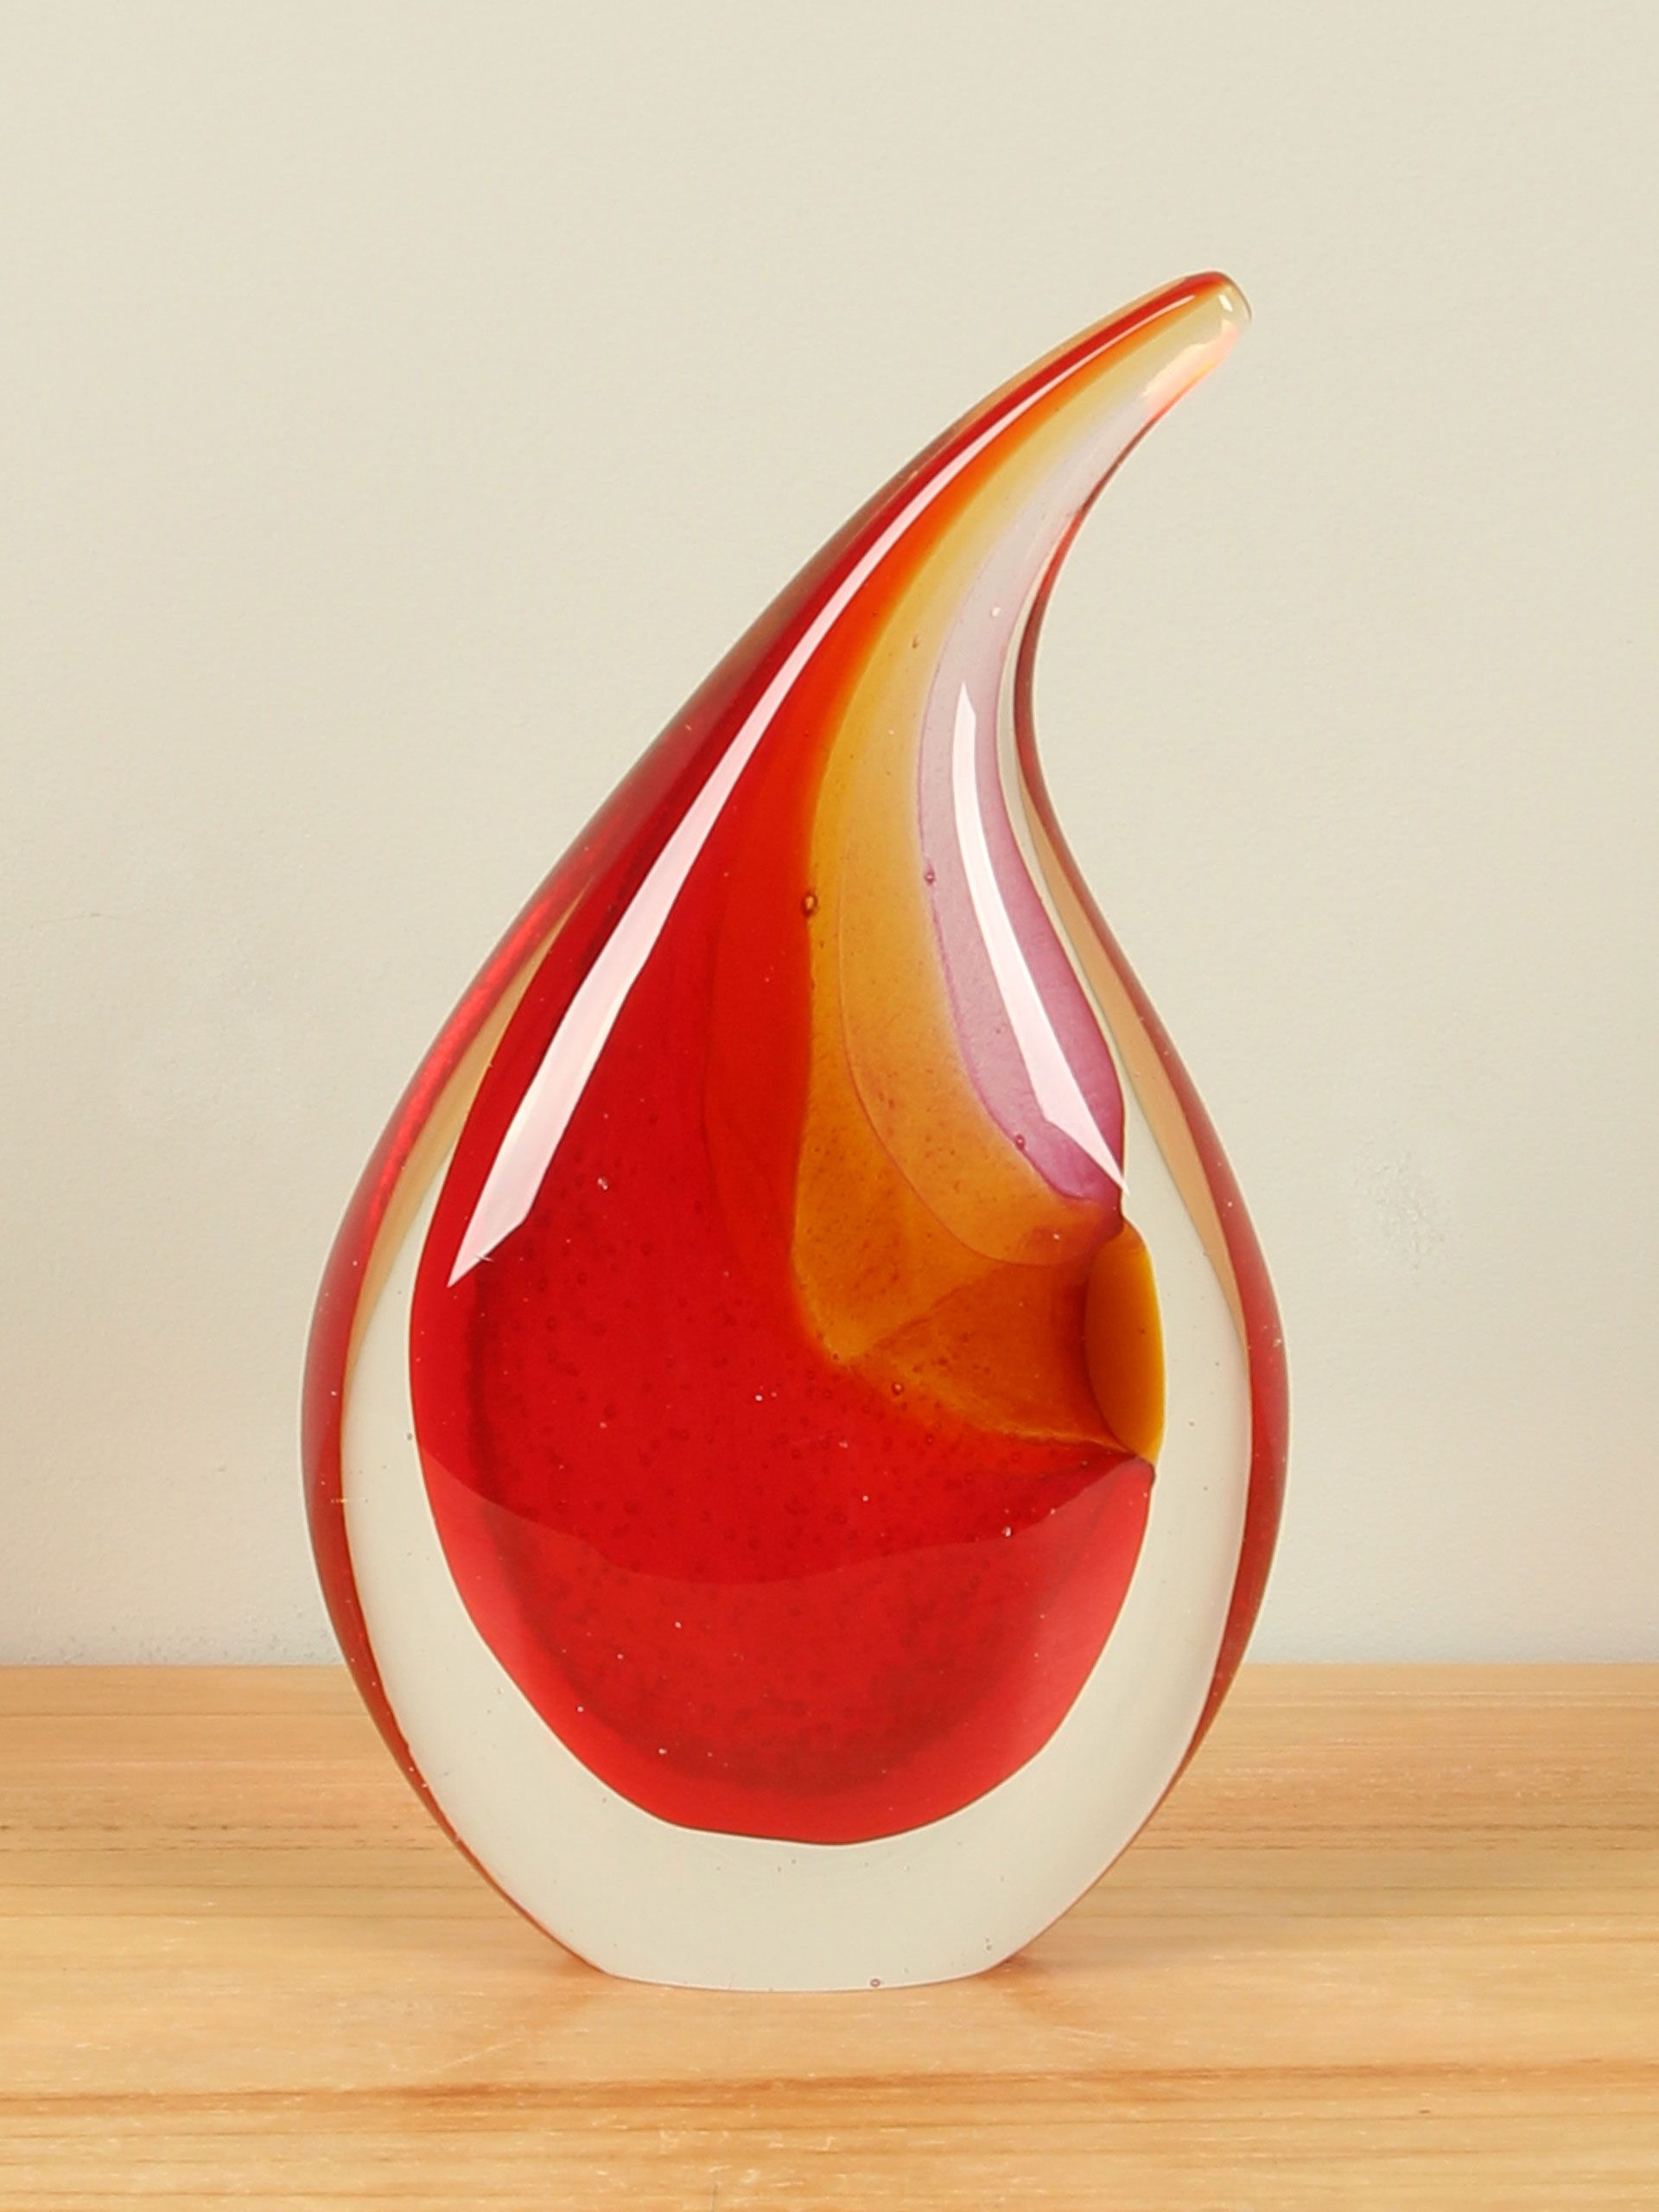 Glazen druppel rood/geel, 19 cm 2a003